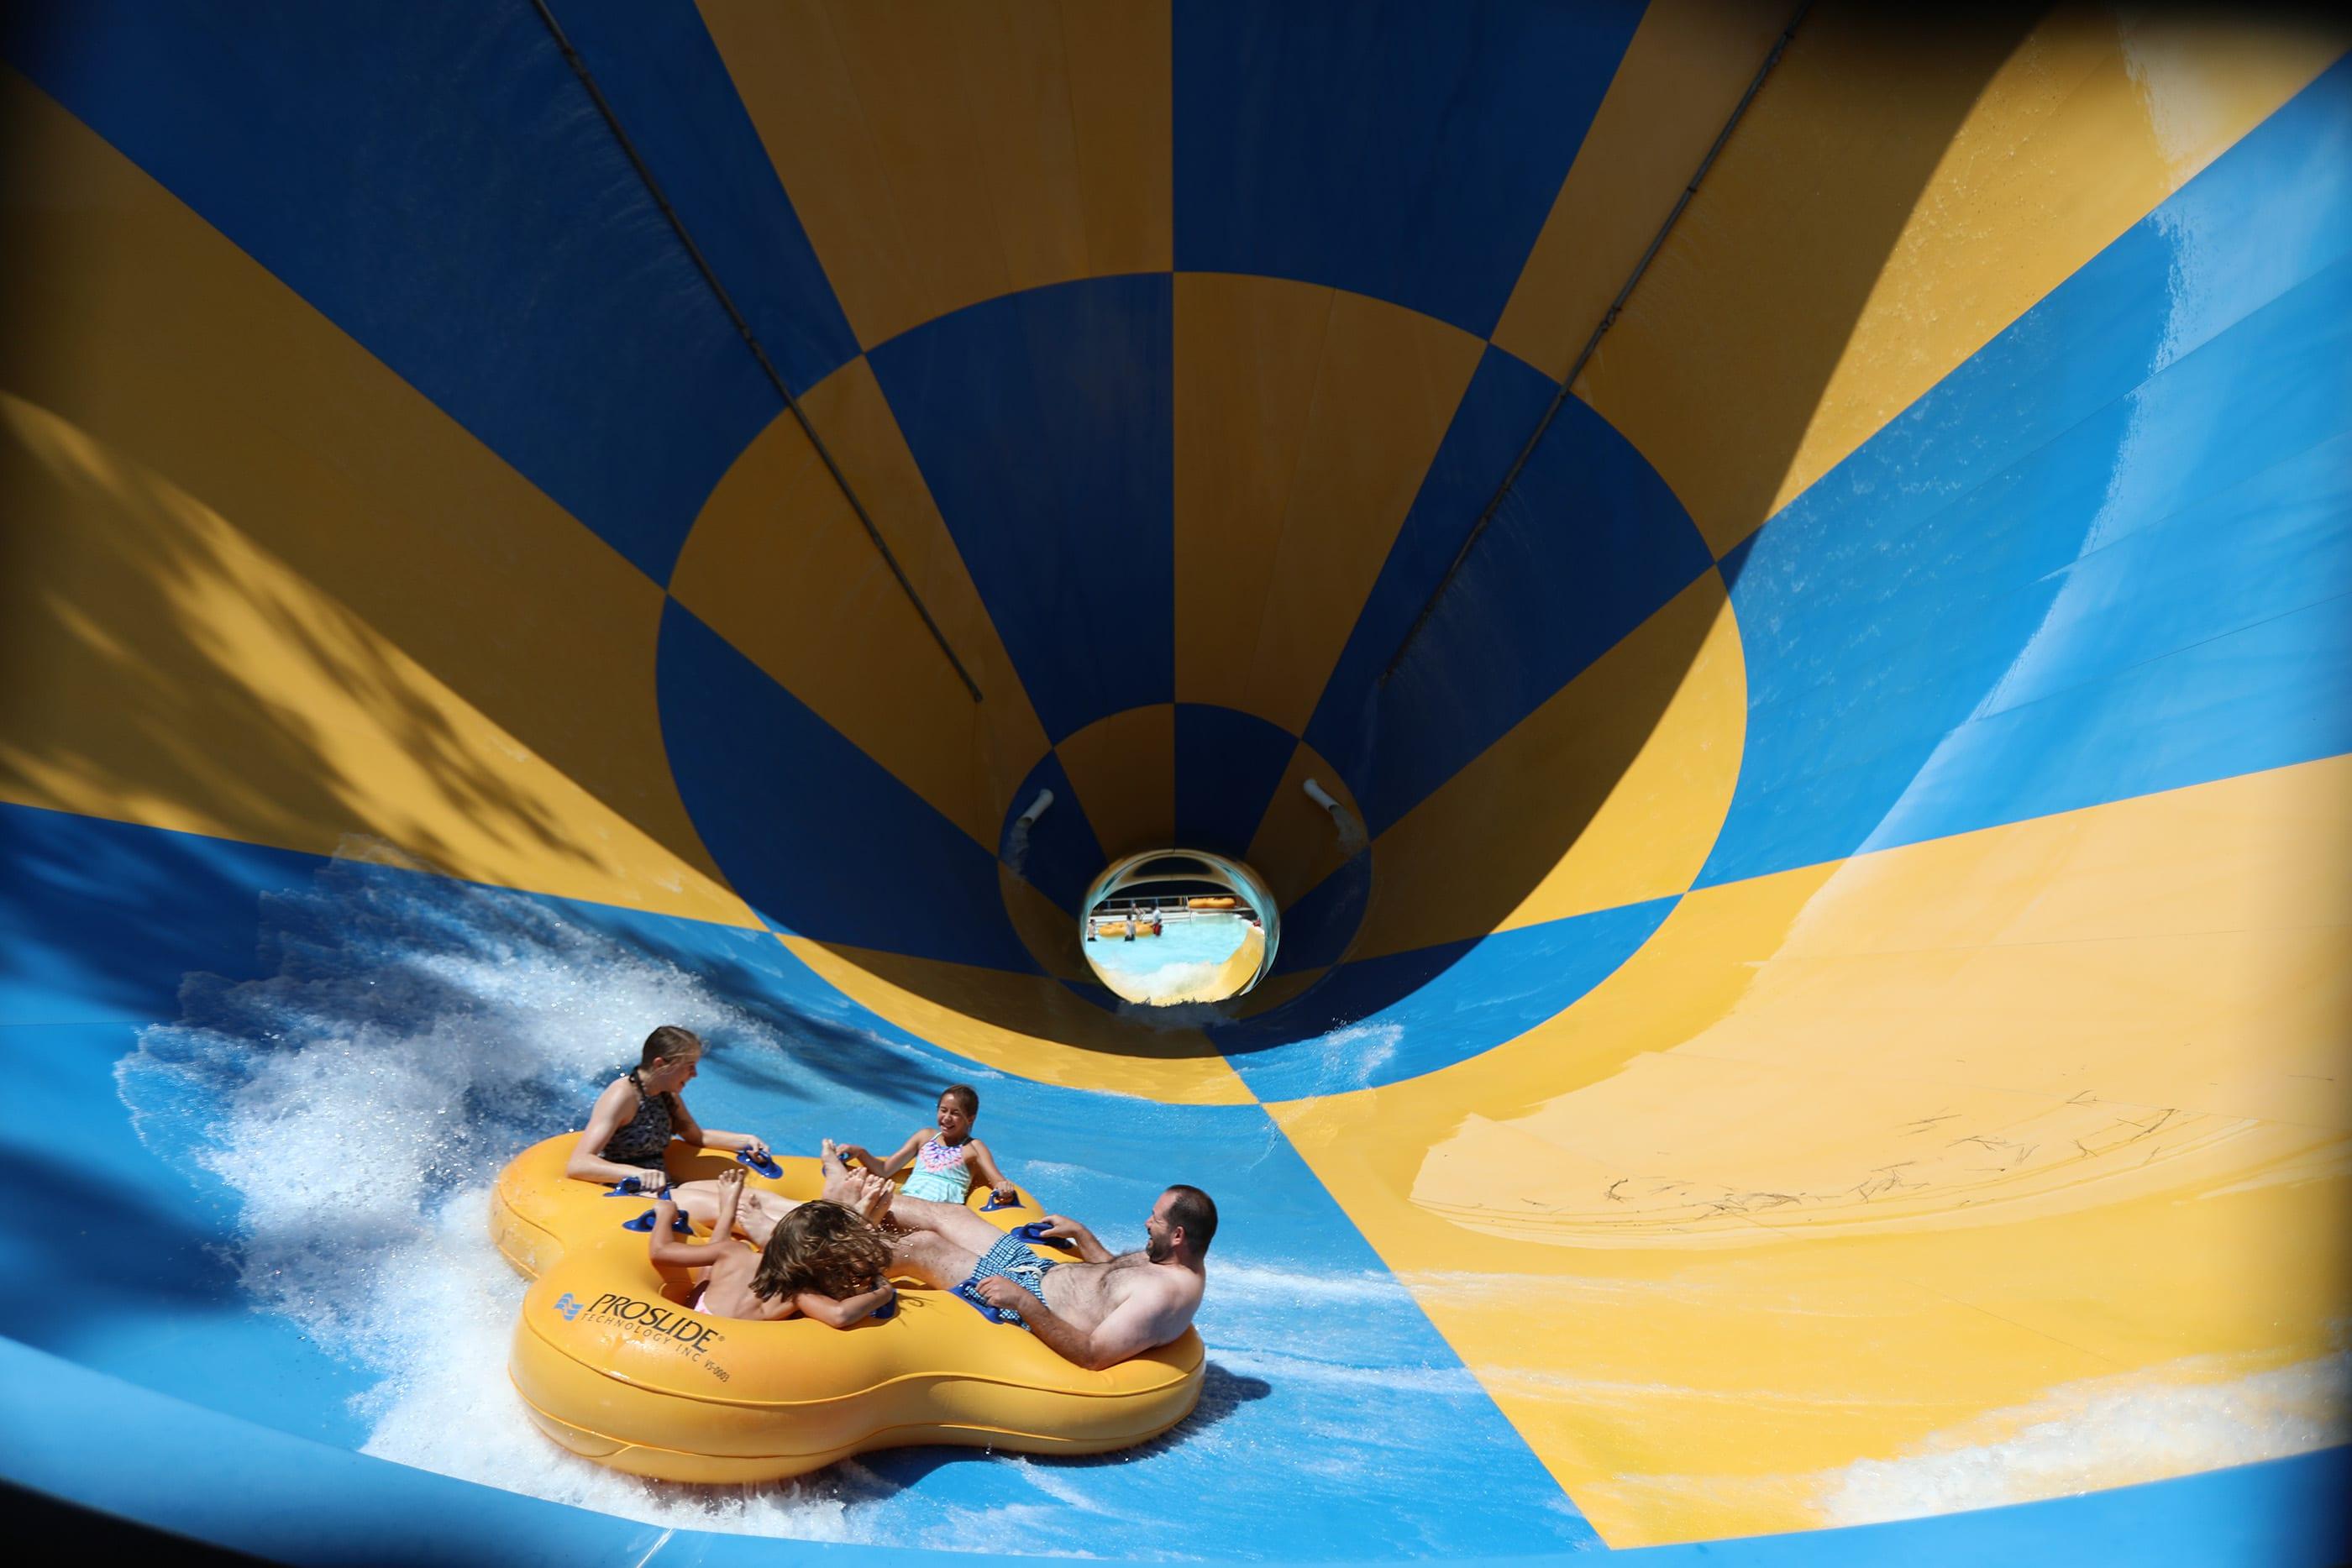 Six Flags White Water en Georgia ofrece diversión sin igual